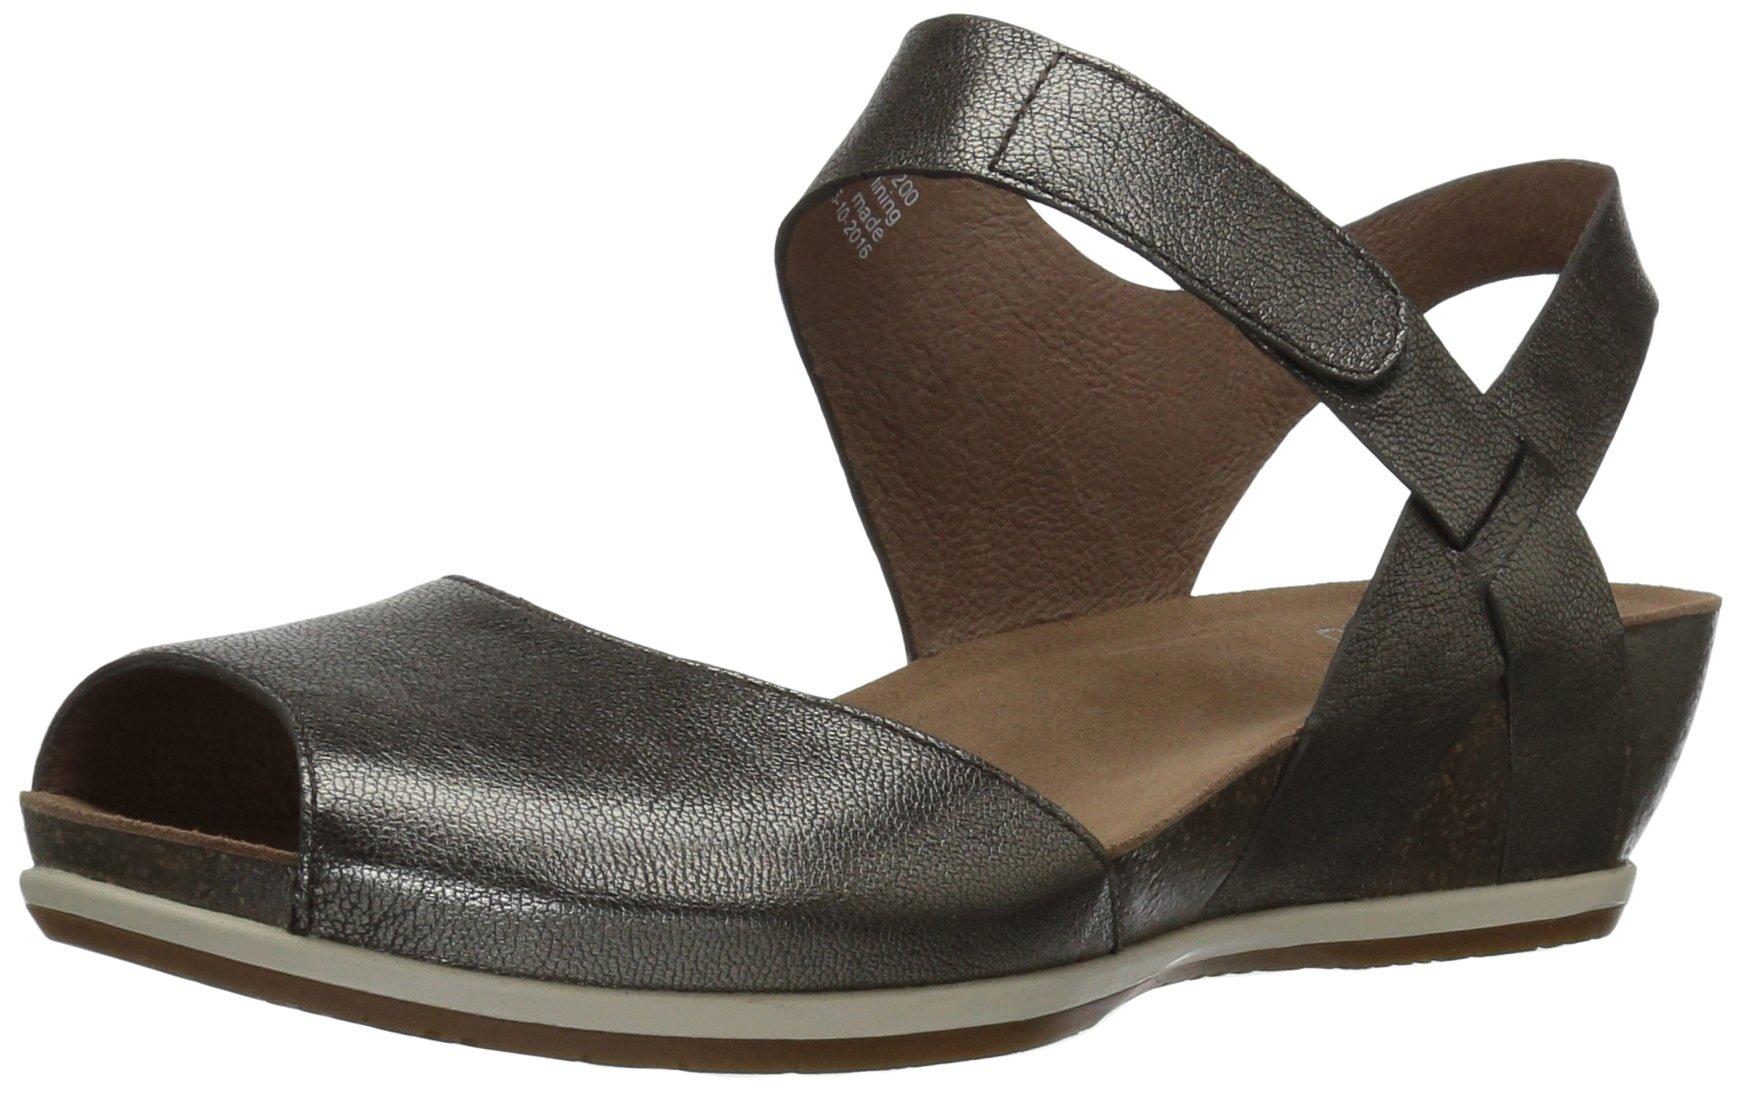 Dansko Women's Vera Flat Sandal, Pewter Nappa, 39 M EU (8.5-9 US)